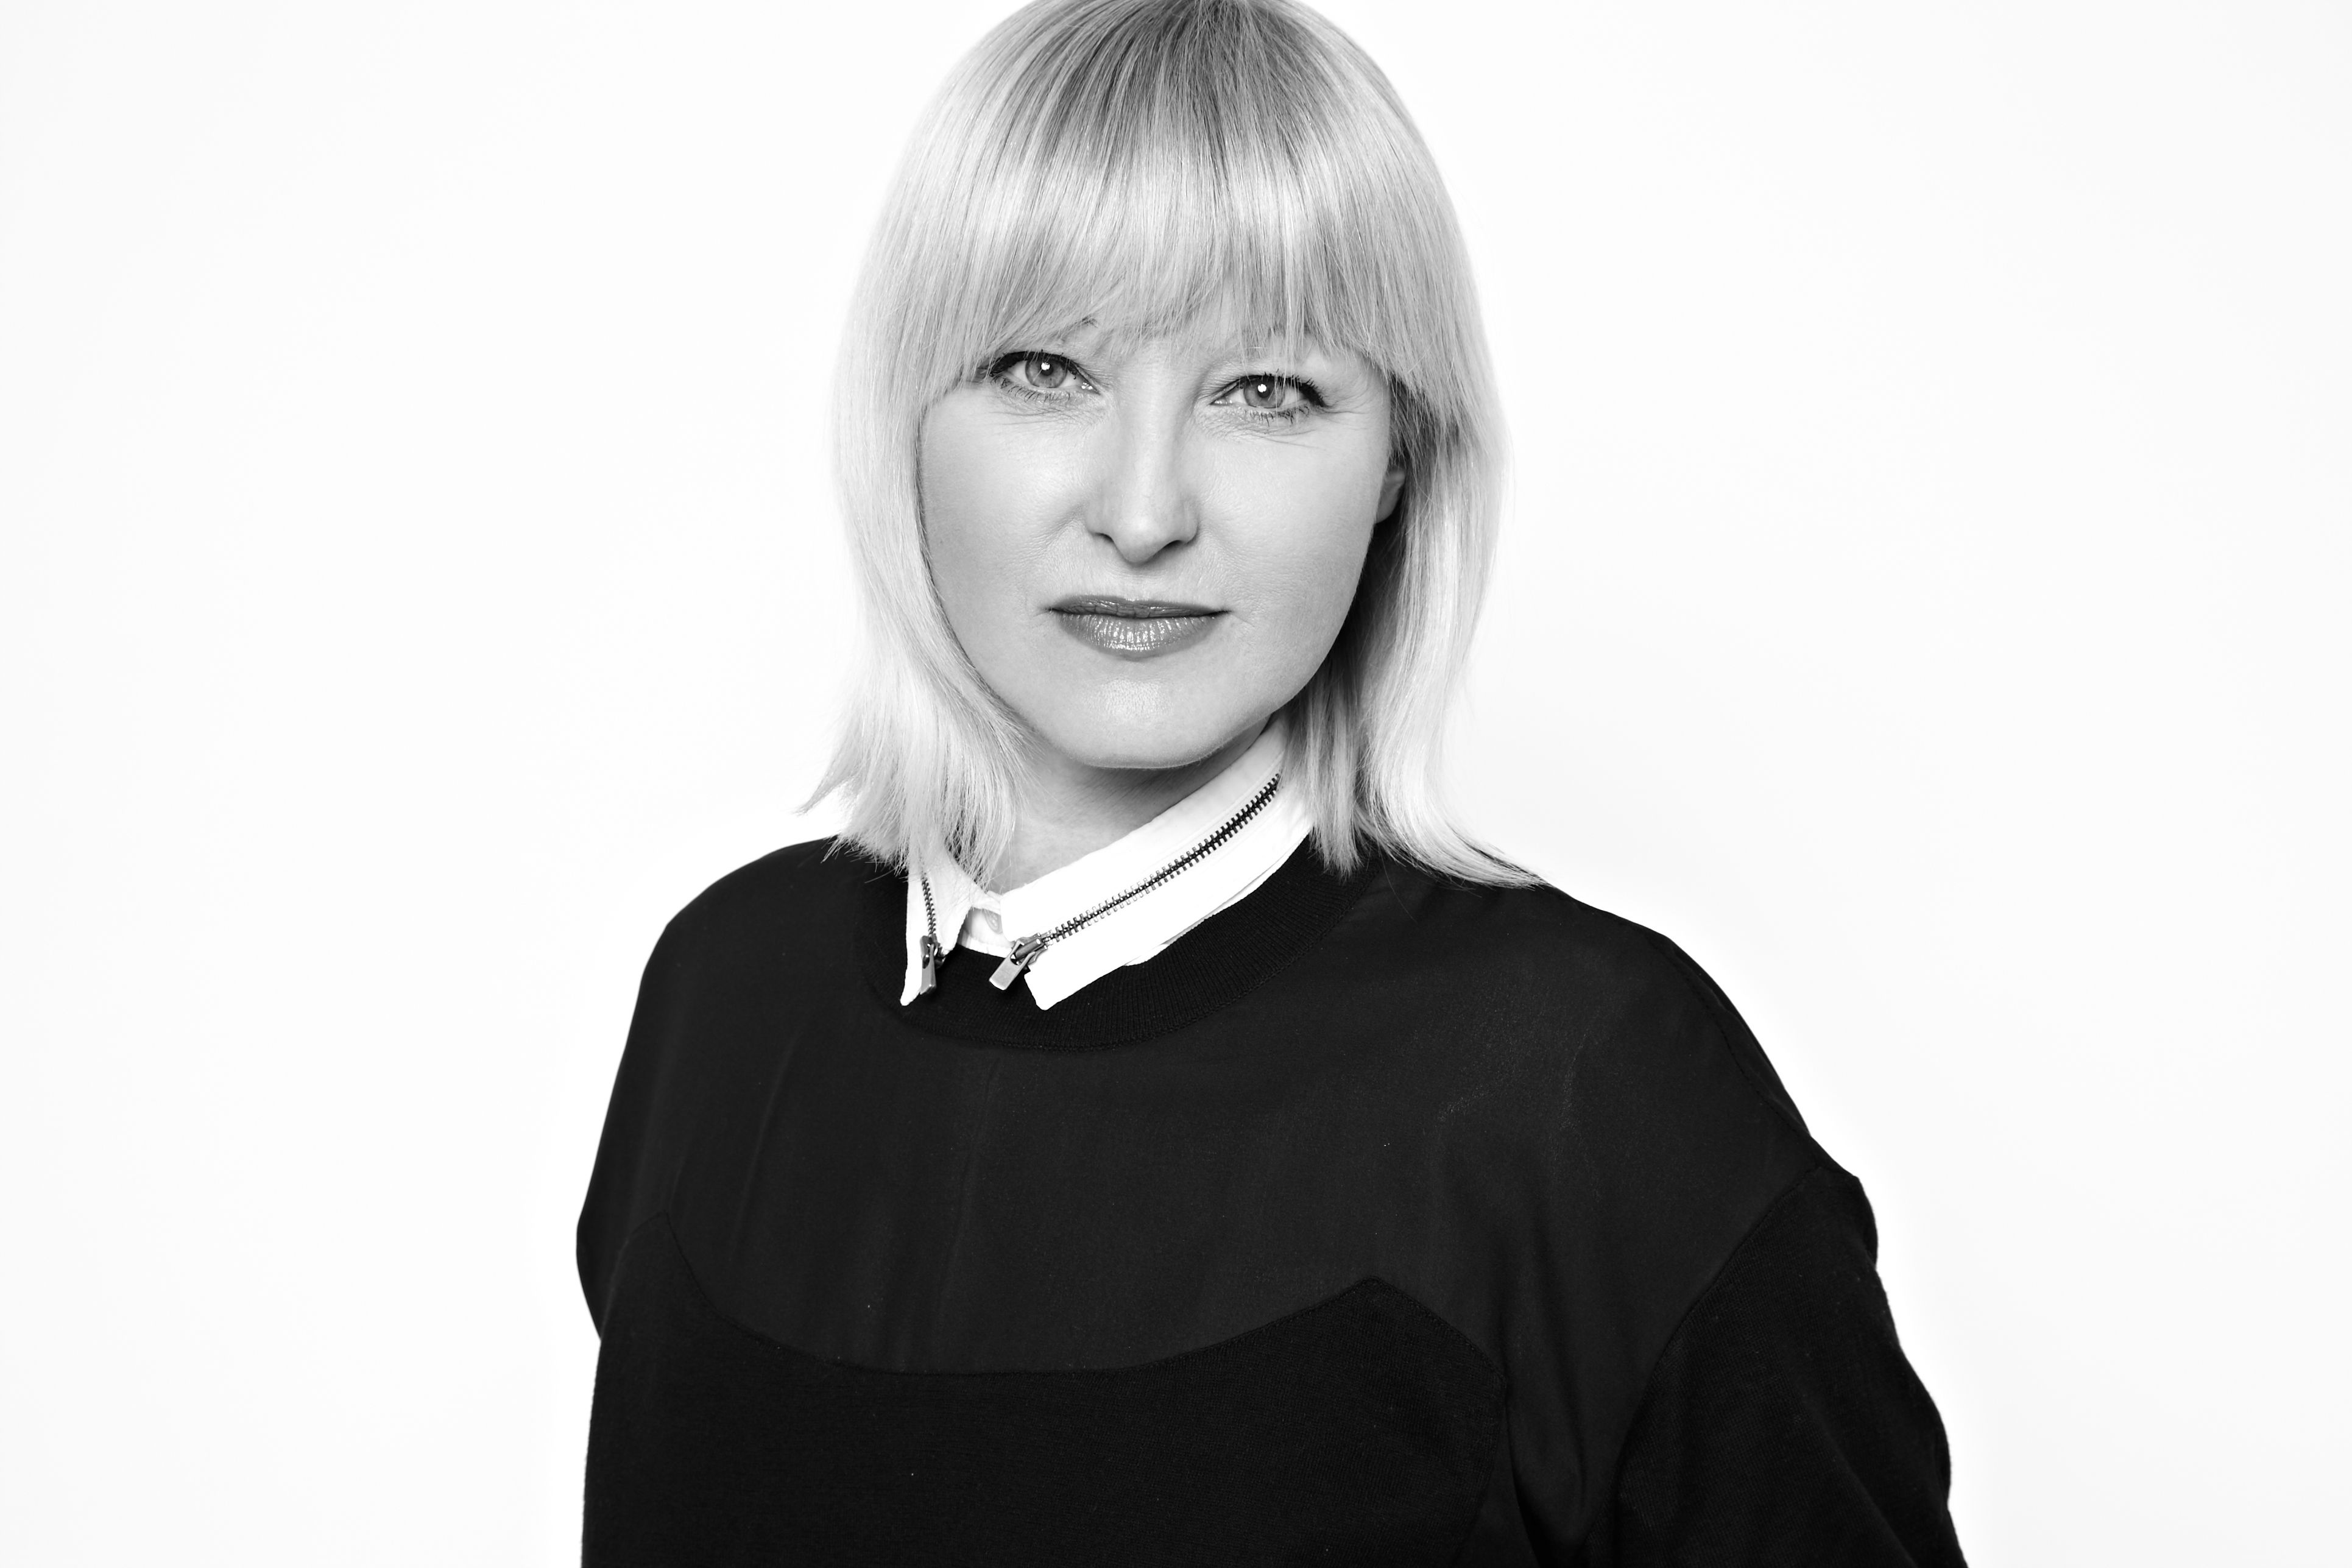 Jacqui Markham - ASOS Womenswear Director